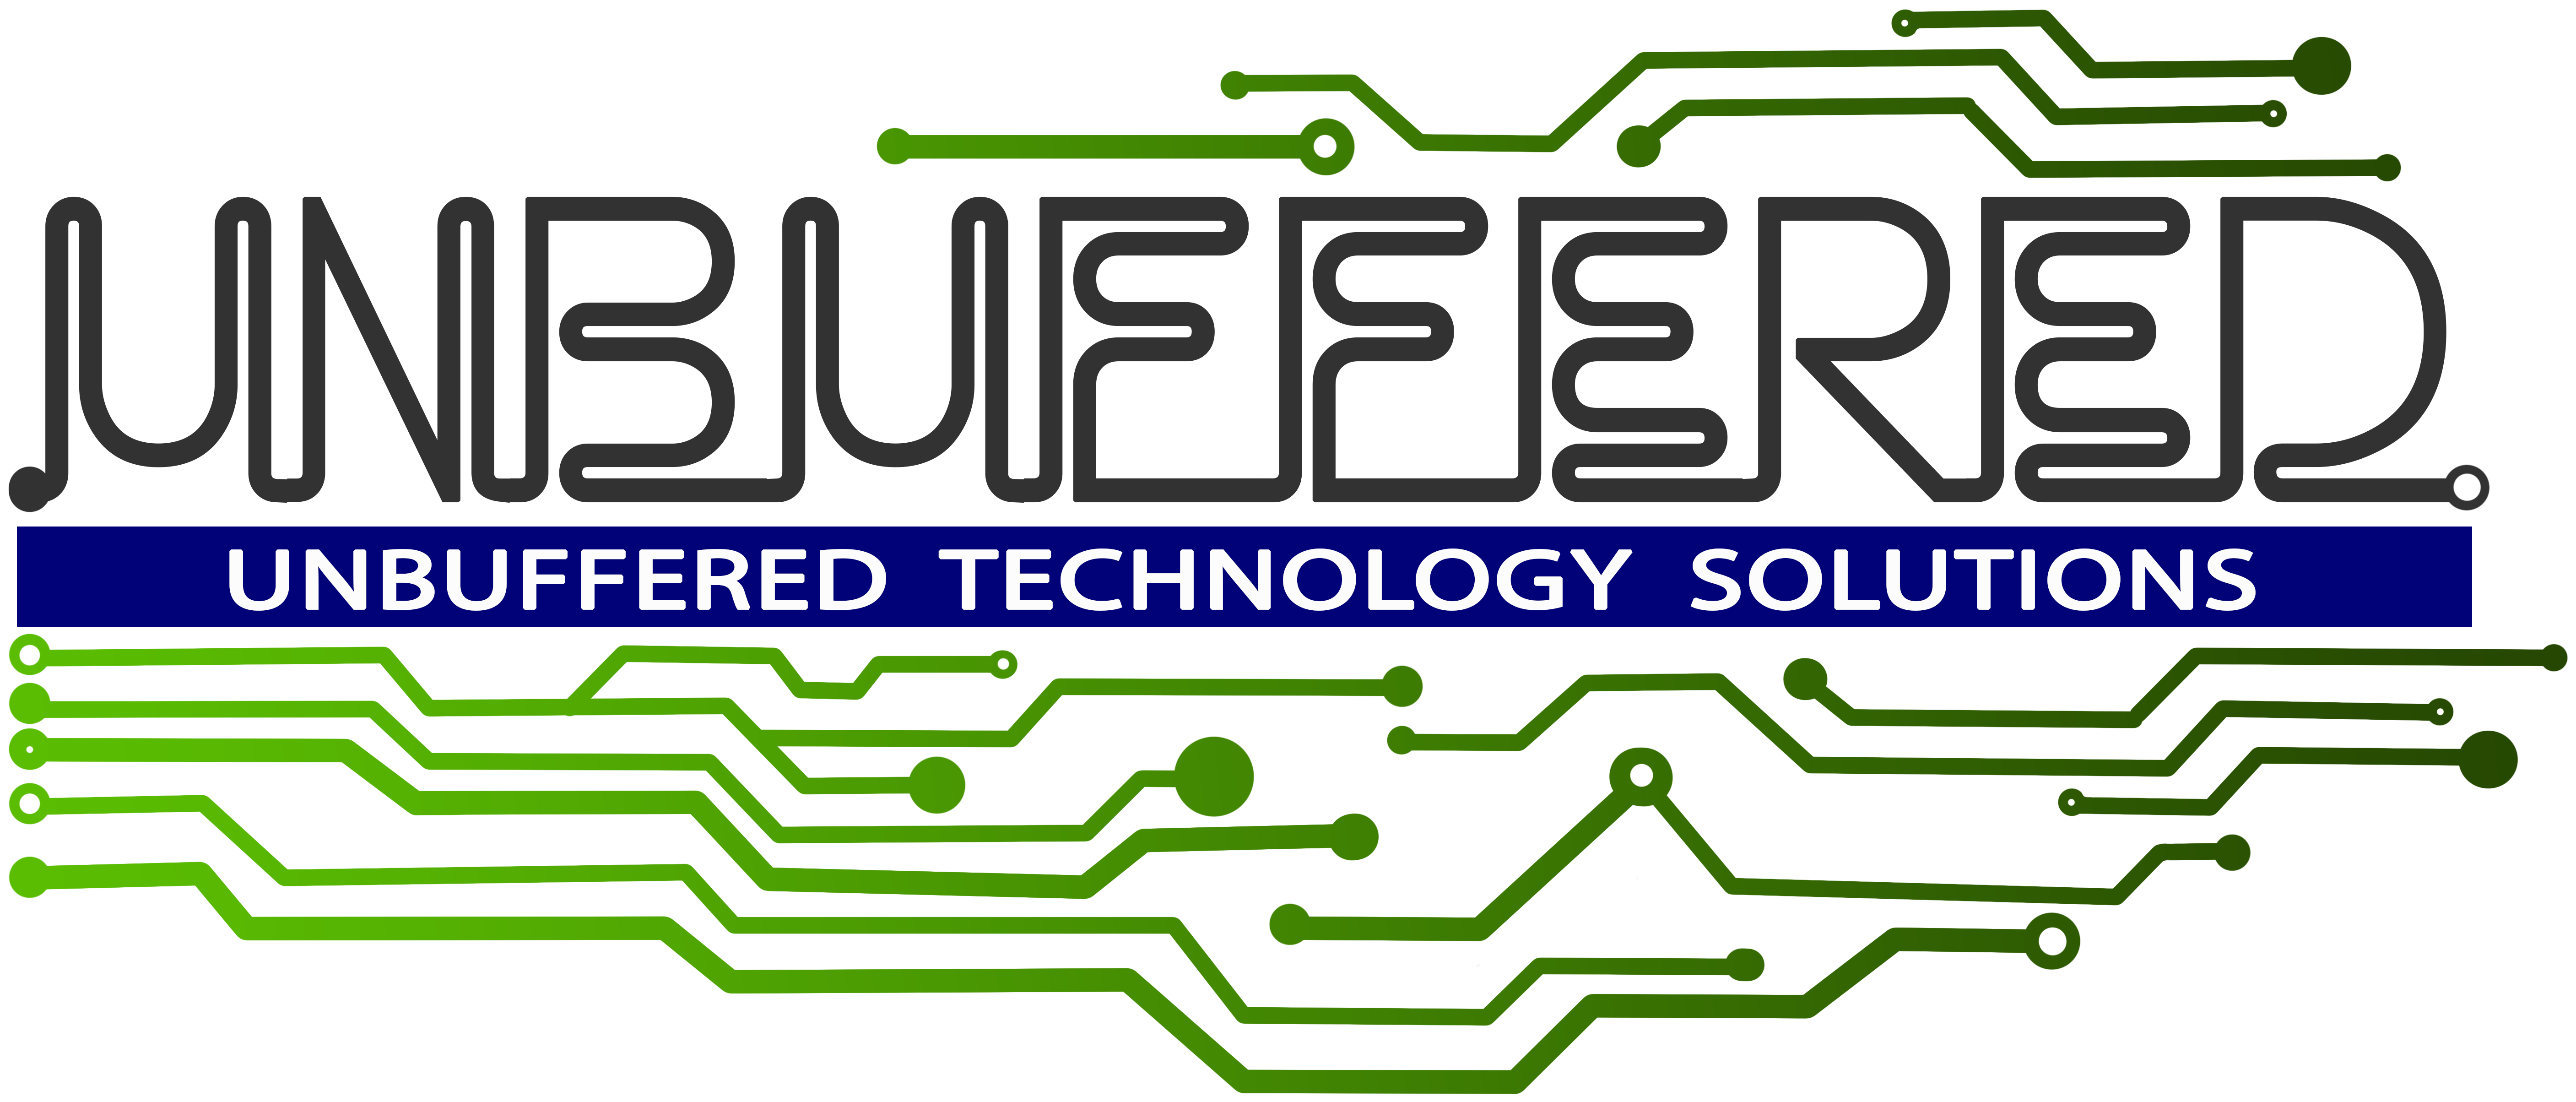 Unbuffered Technology Solutions